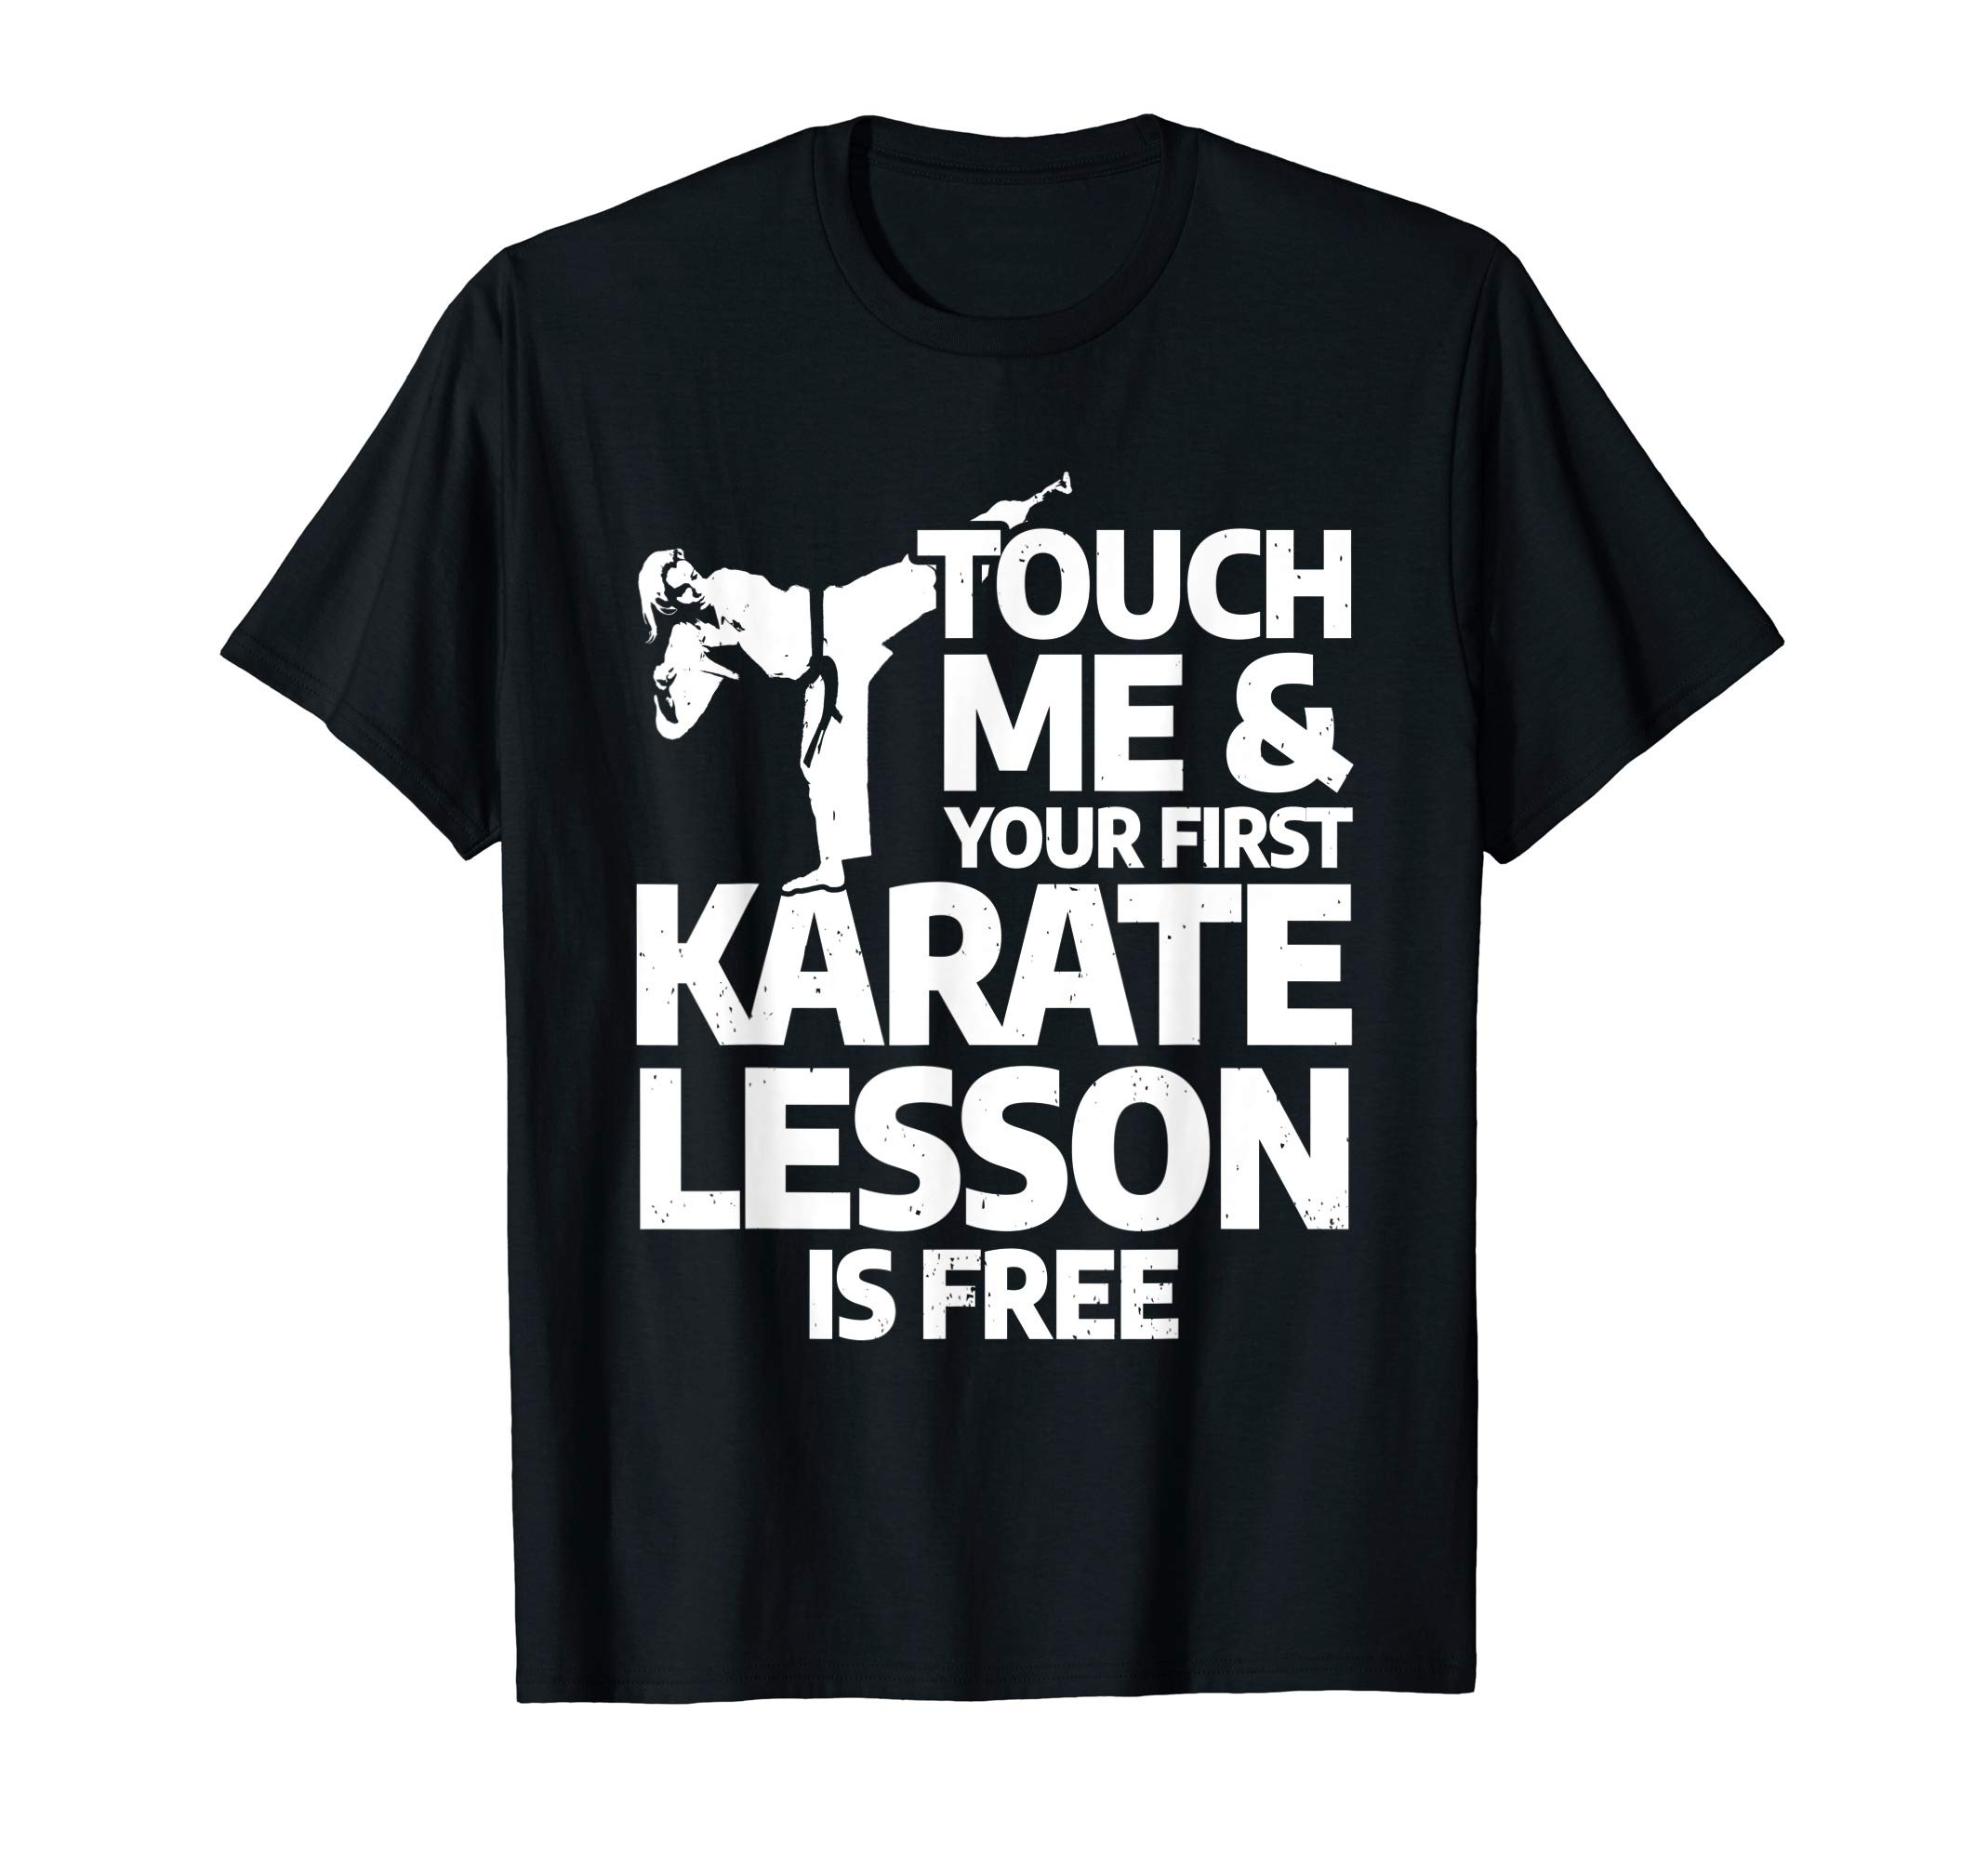 Martial Arts Karate Taekwondo for Girls - Karate Lesson T-Shirt by Karate Martial Arts Shirts